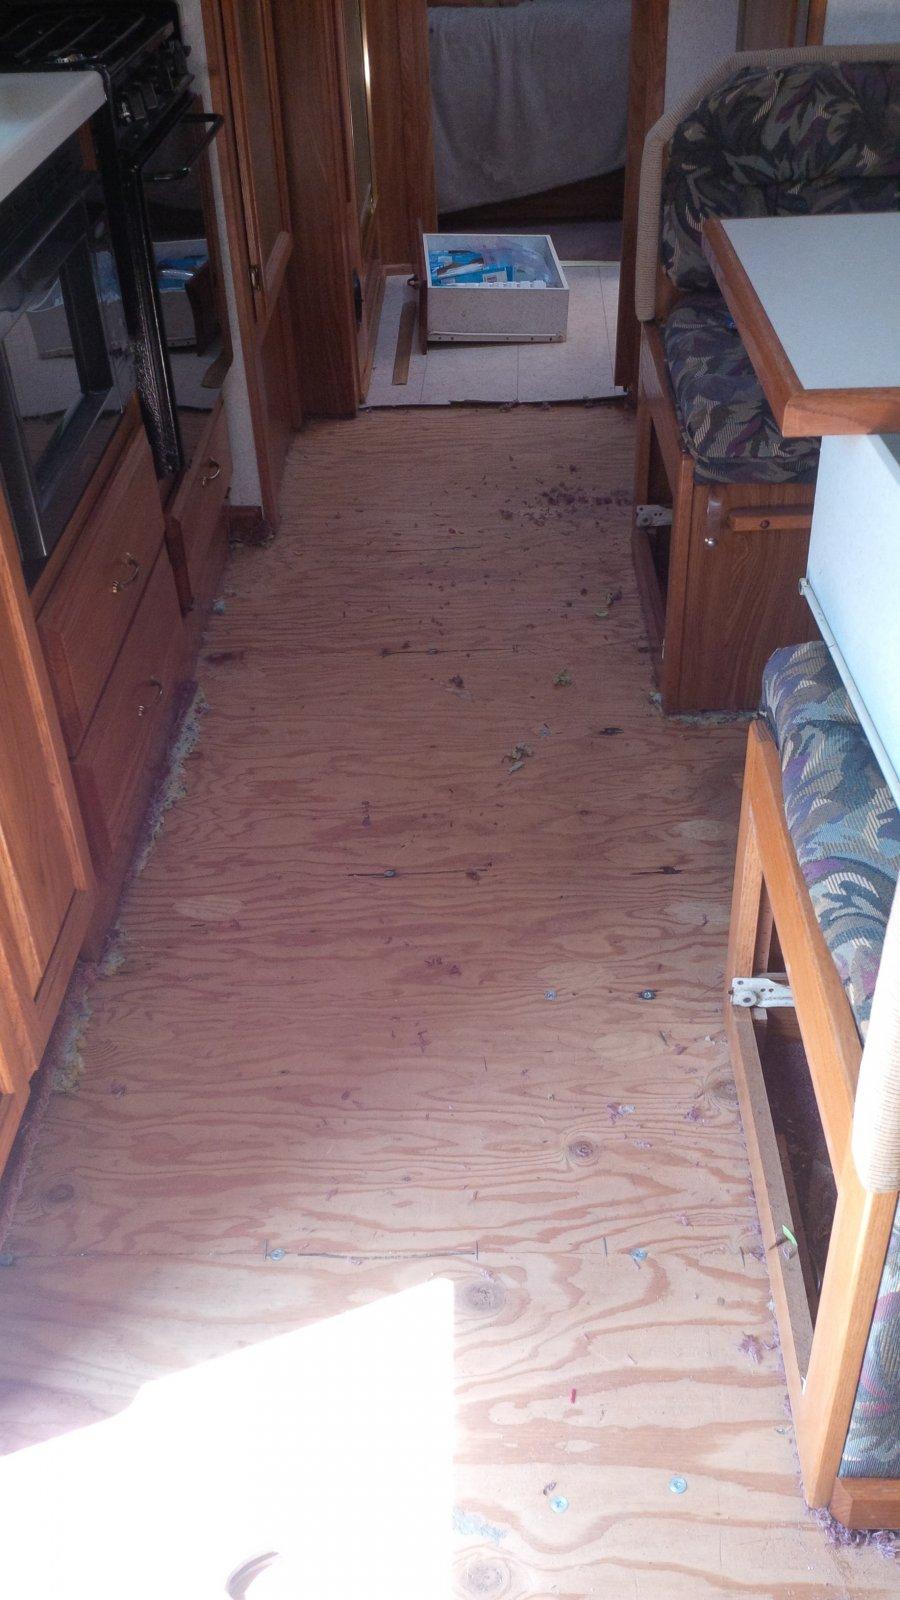 Click image for larger version  Name:carpet gone 2.jpg Views:402 Size:197.8 KB ID:185255